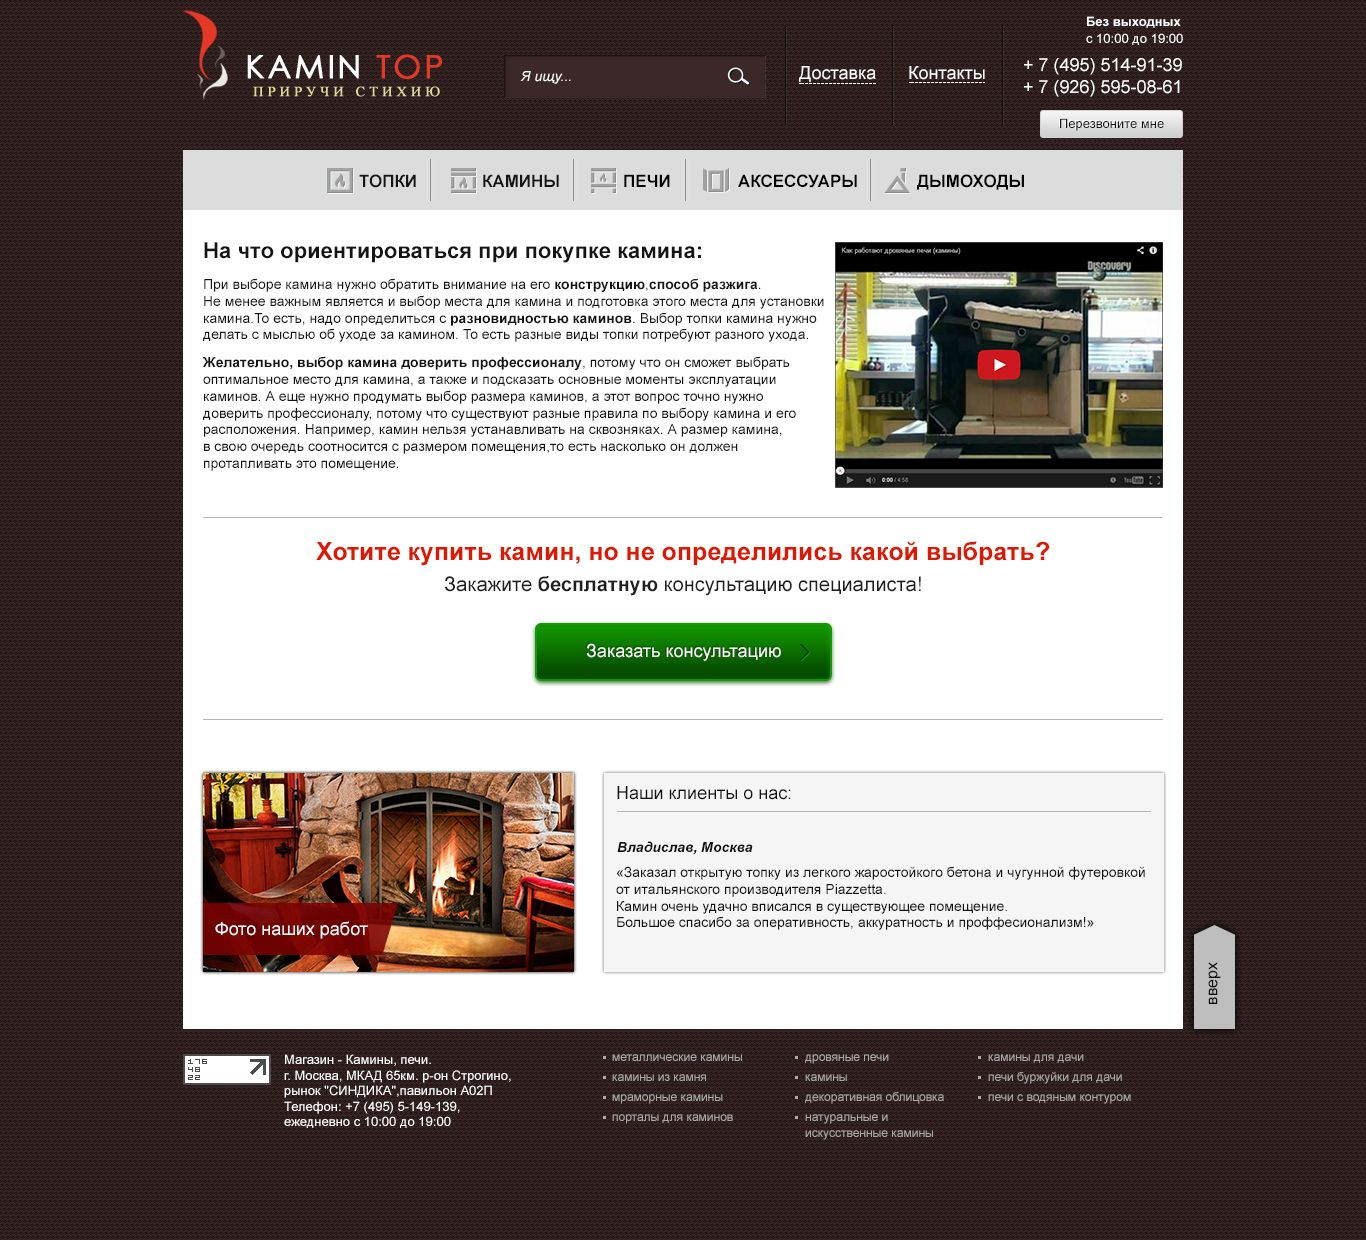 Дизайн сайта интернет магазина - дизайнер marianna_perev